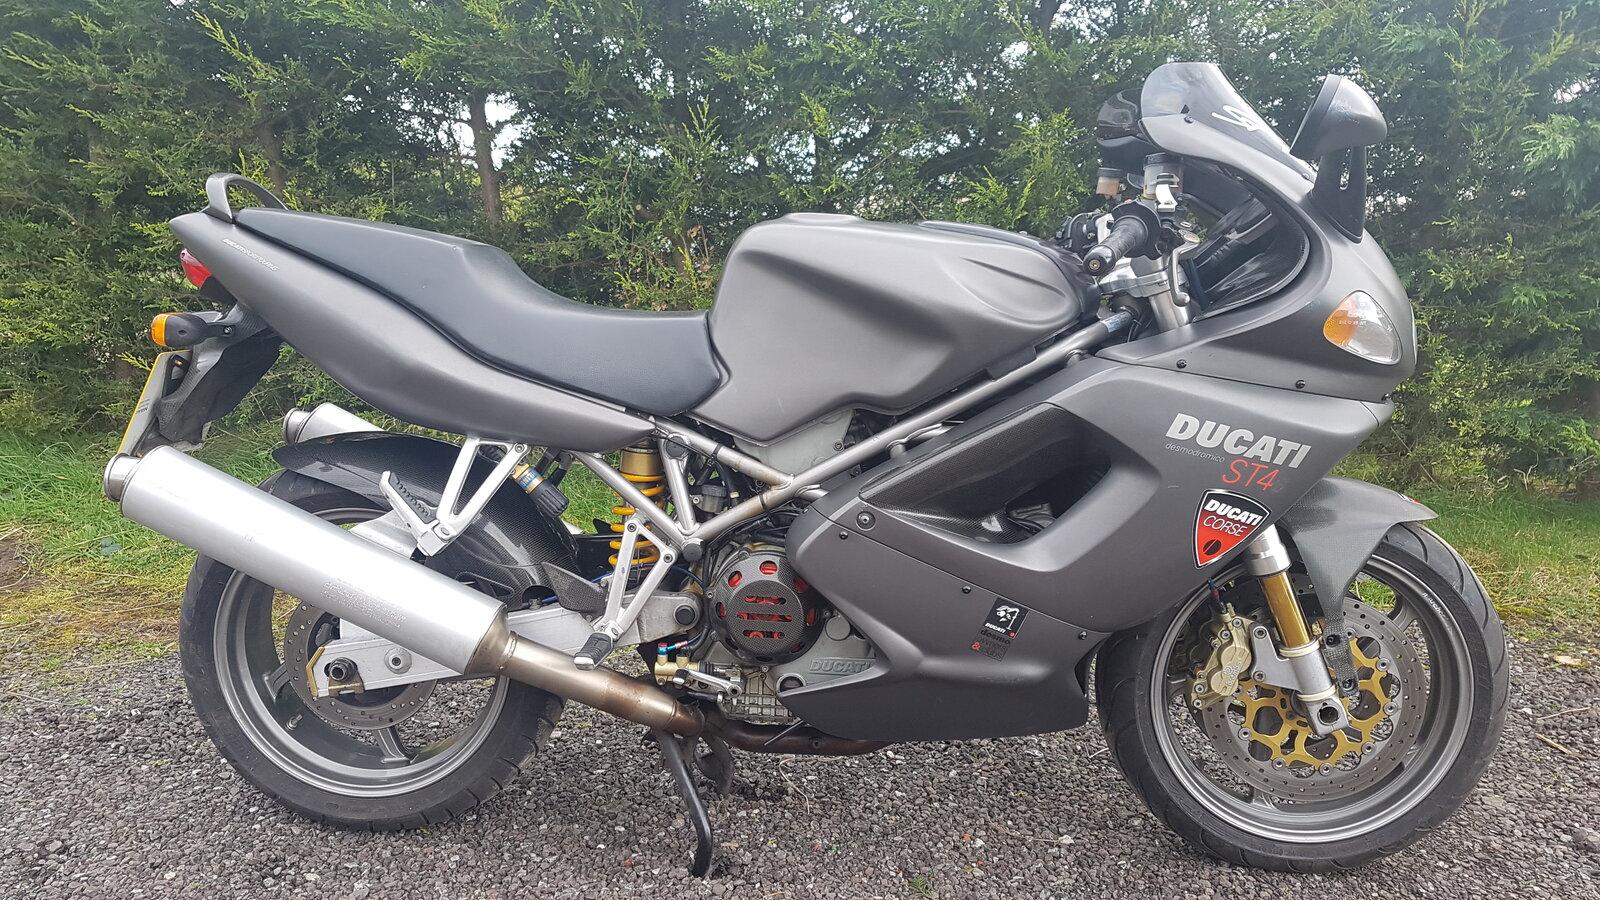 Ducati ST4 S Bike a.jpg